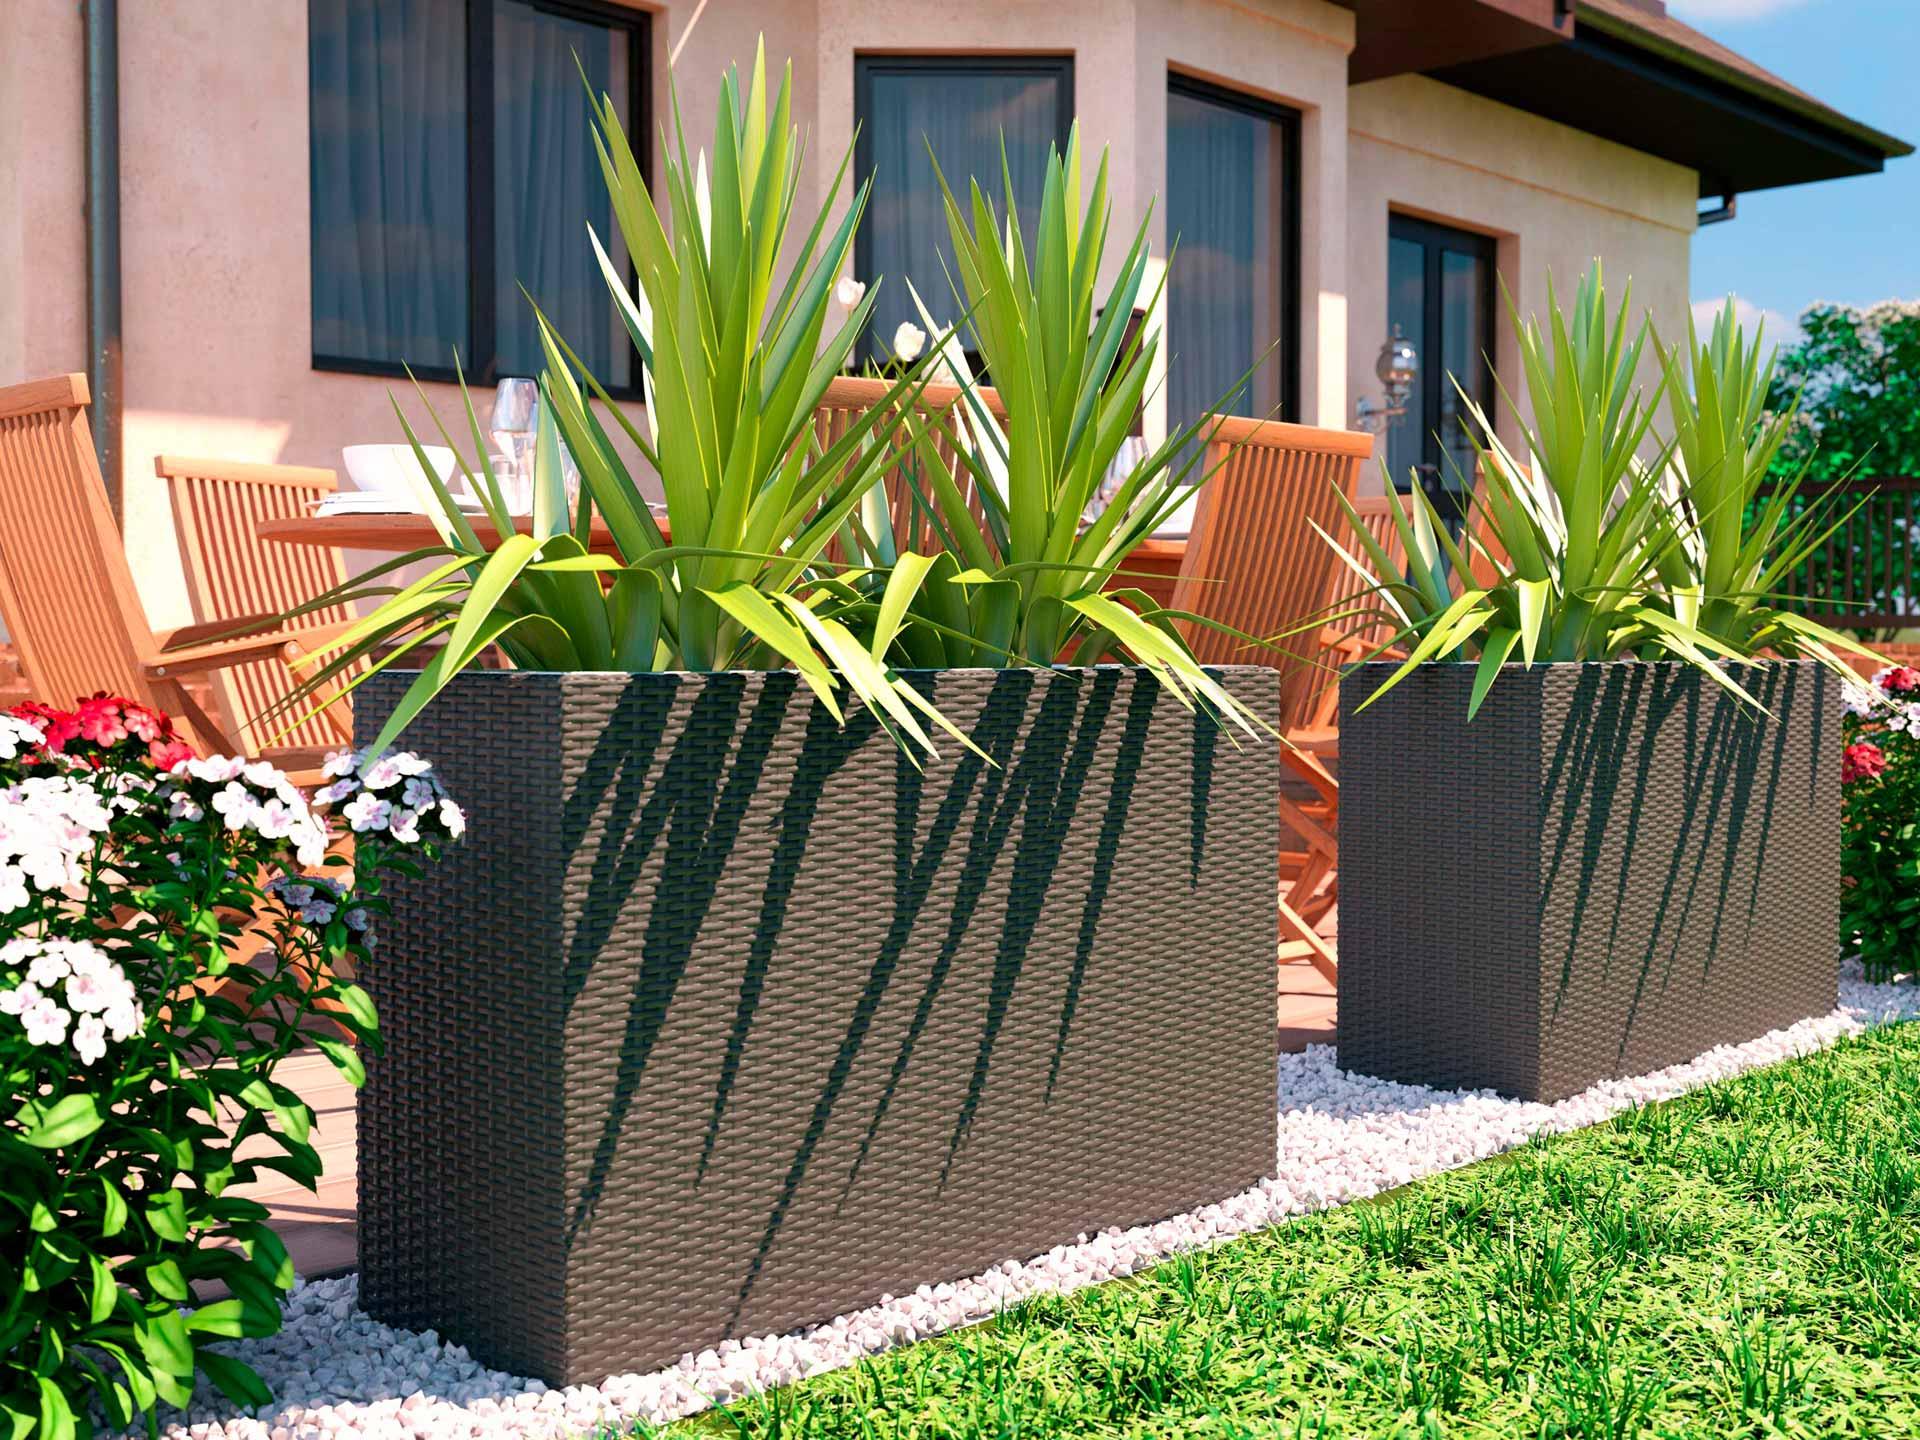 artelia fr pot de fleur en r sine tress e natura m. Black Bedroom Furniture Sets. Home Design Ideas